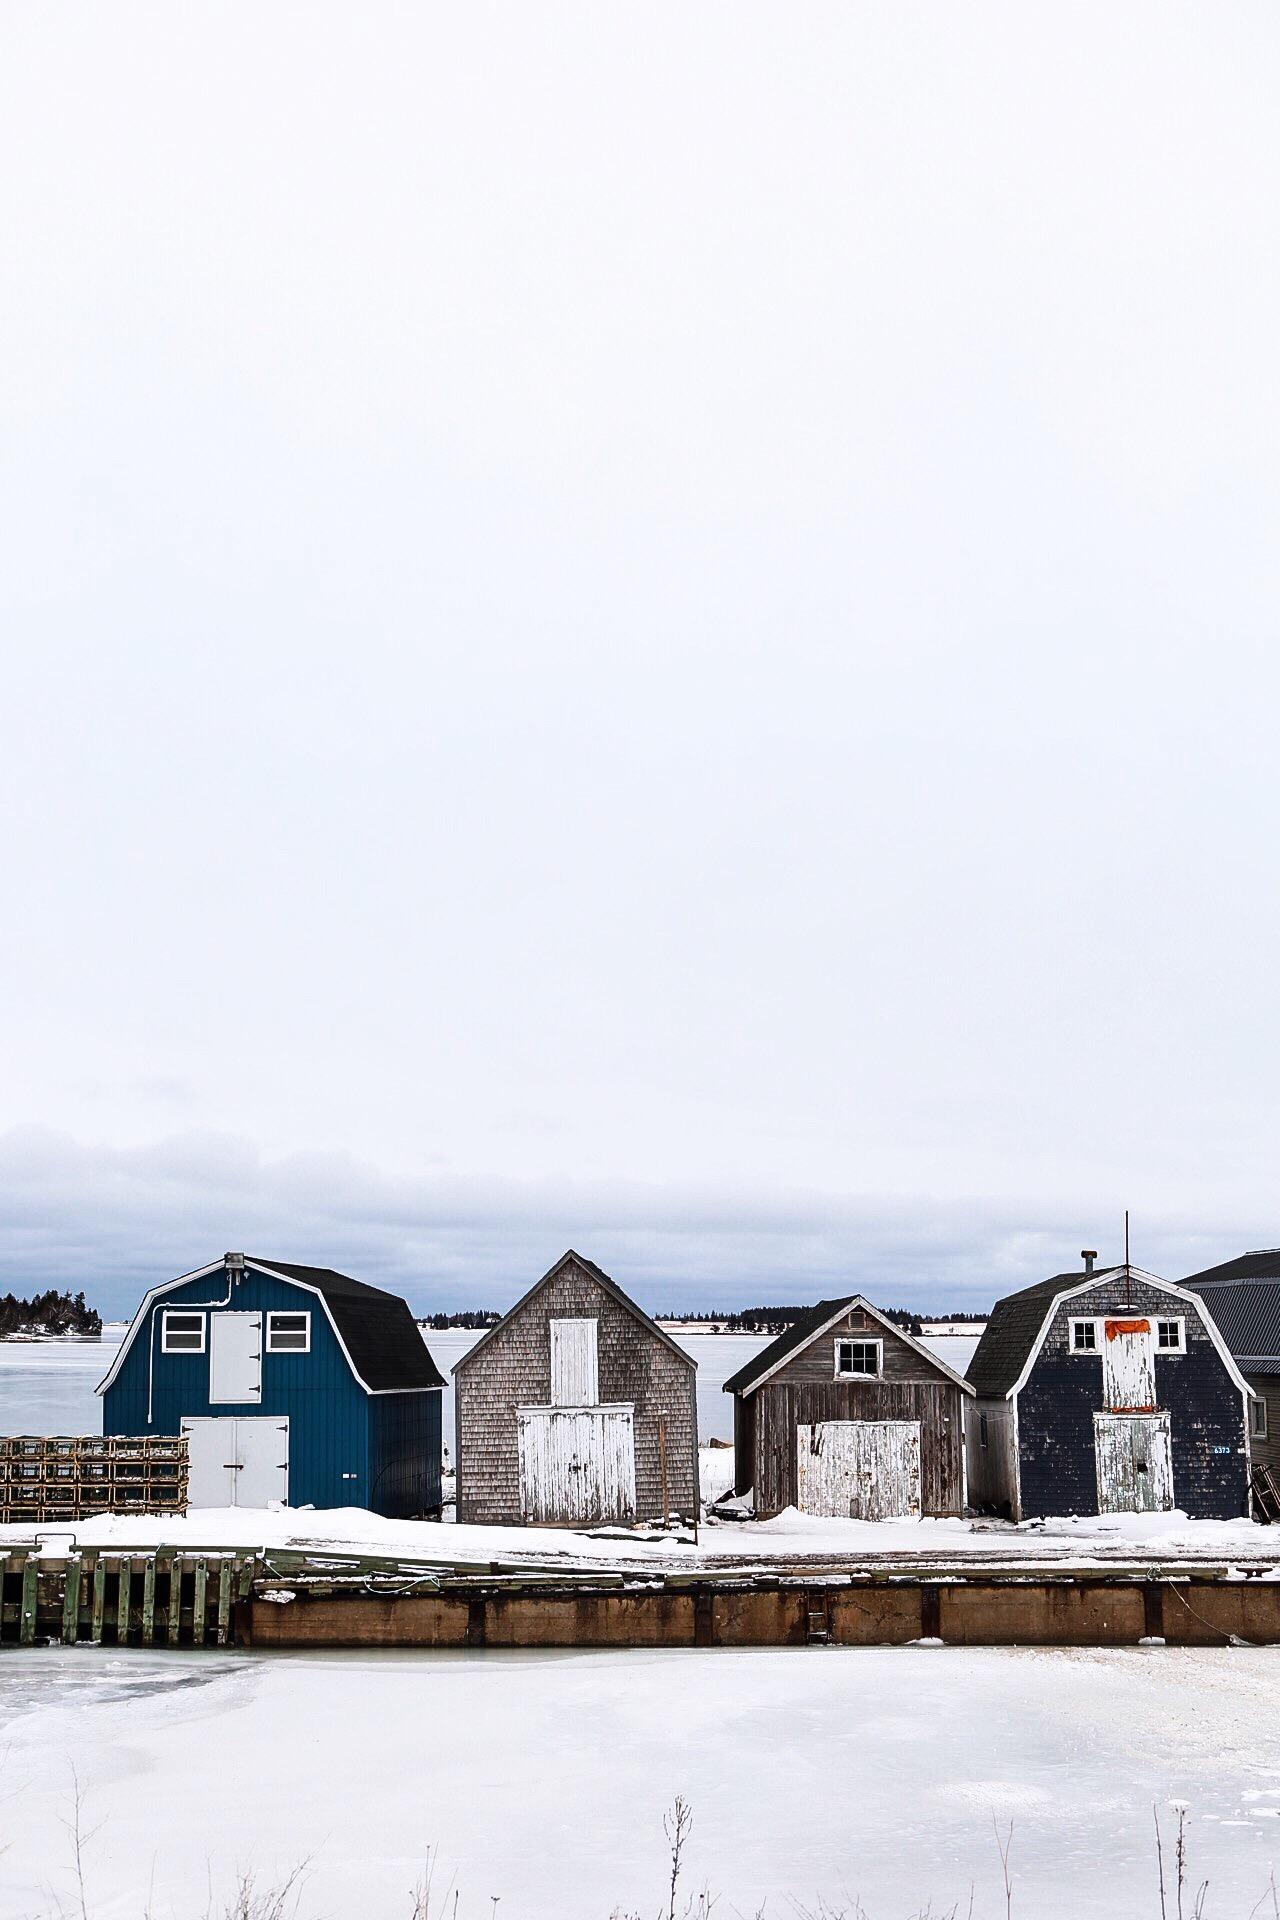 Fishing sheds on in Prince Edward Island.